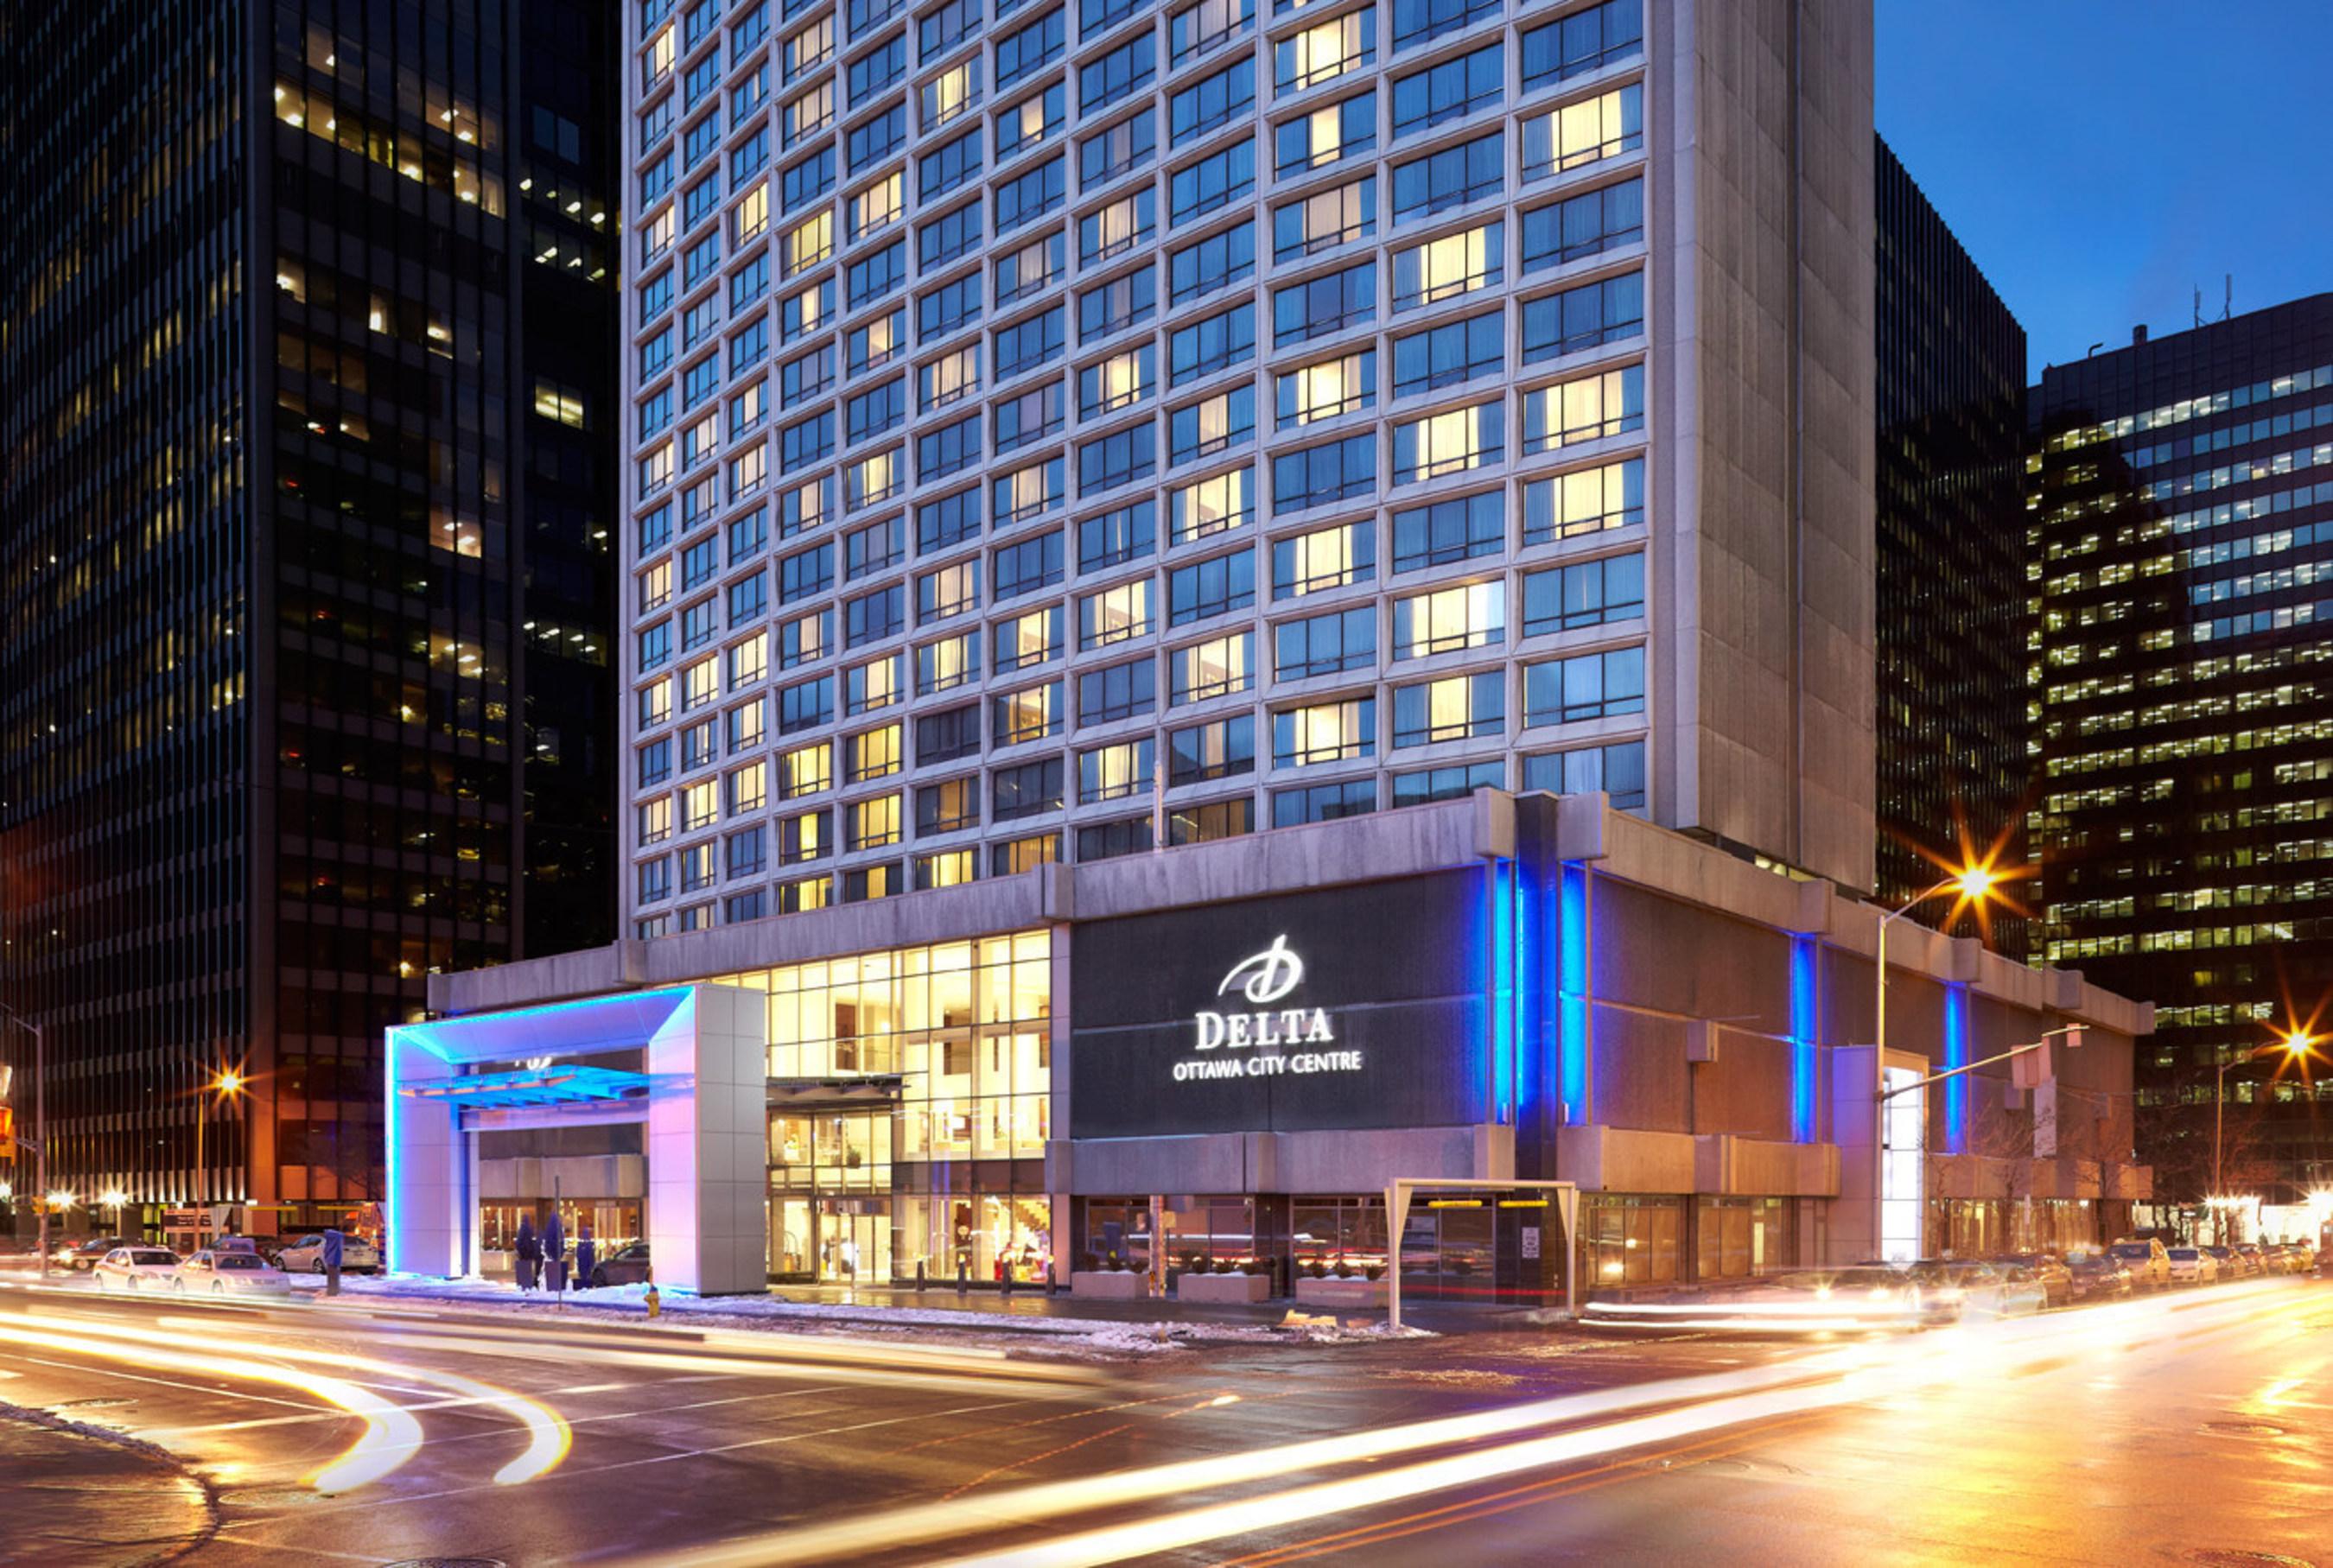 Marriott Signs Definitive Agreement to Acquire Delta Hotels - shown, Delta Ottawa City Centre